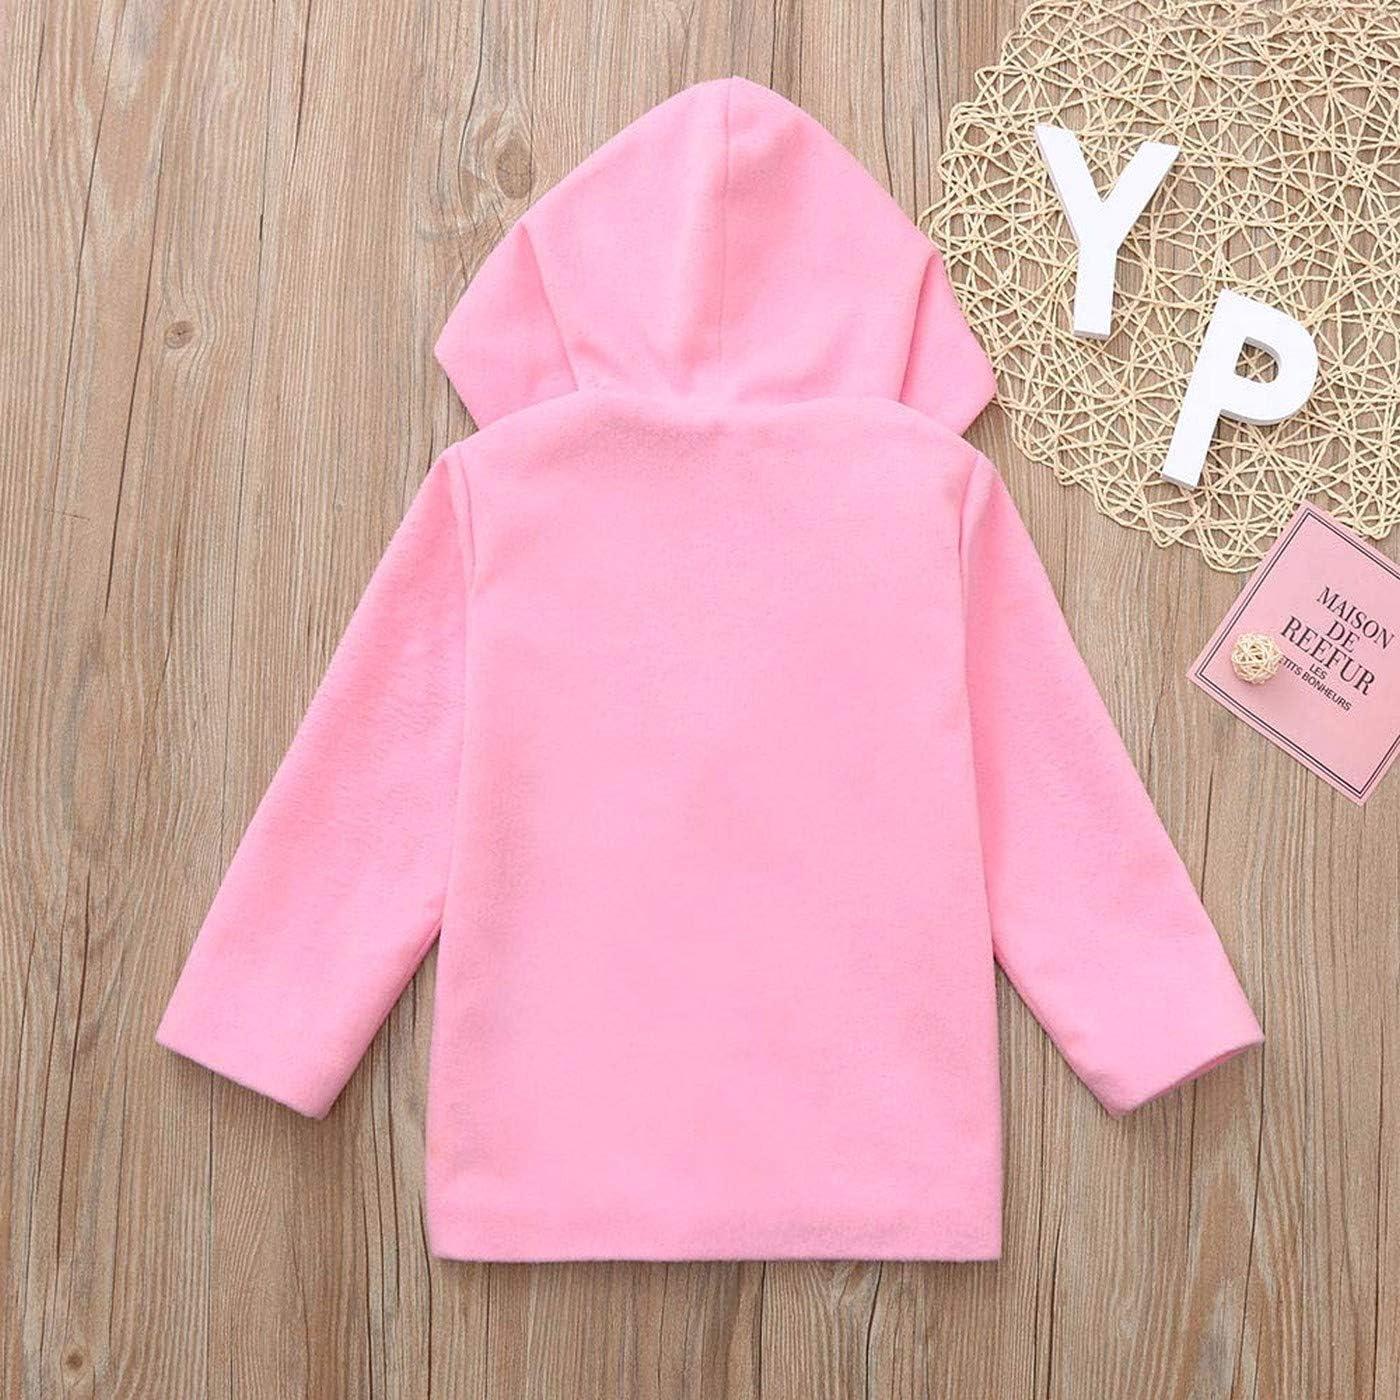 Carlos Foushee Baby Girl Cloak Jacket Thick Warm Outerwear Winter Hoodie Coat Overcoat